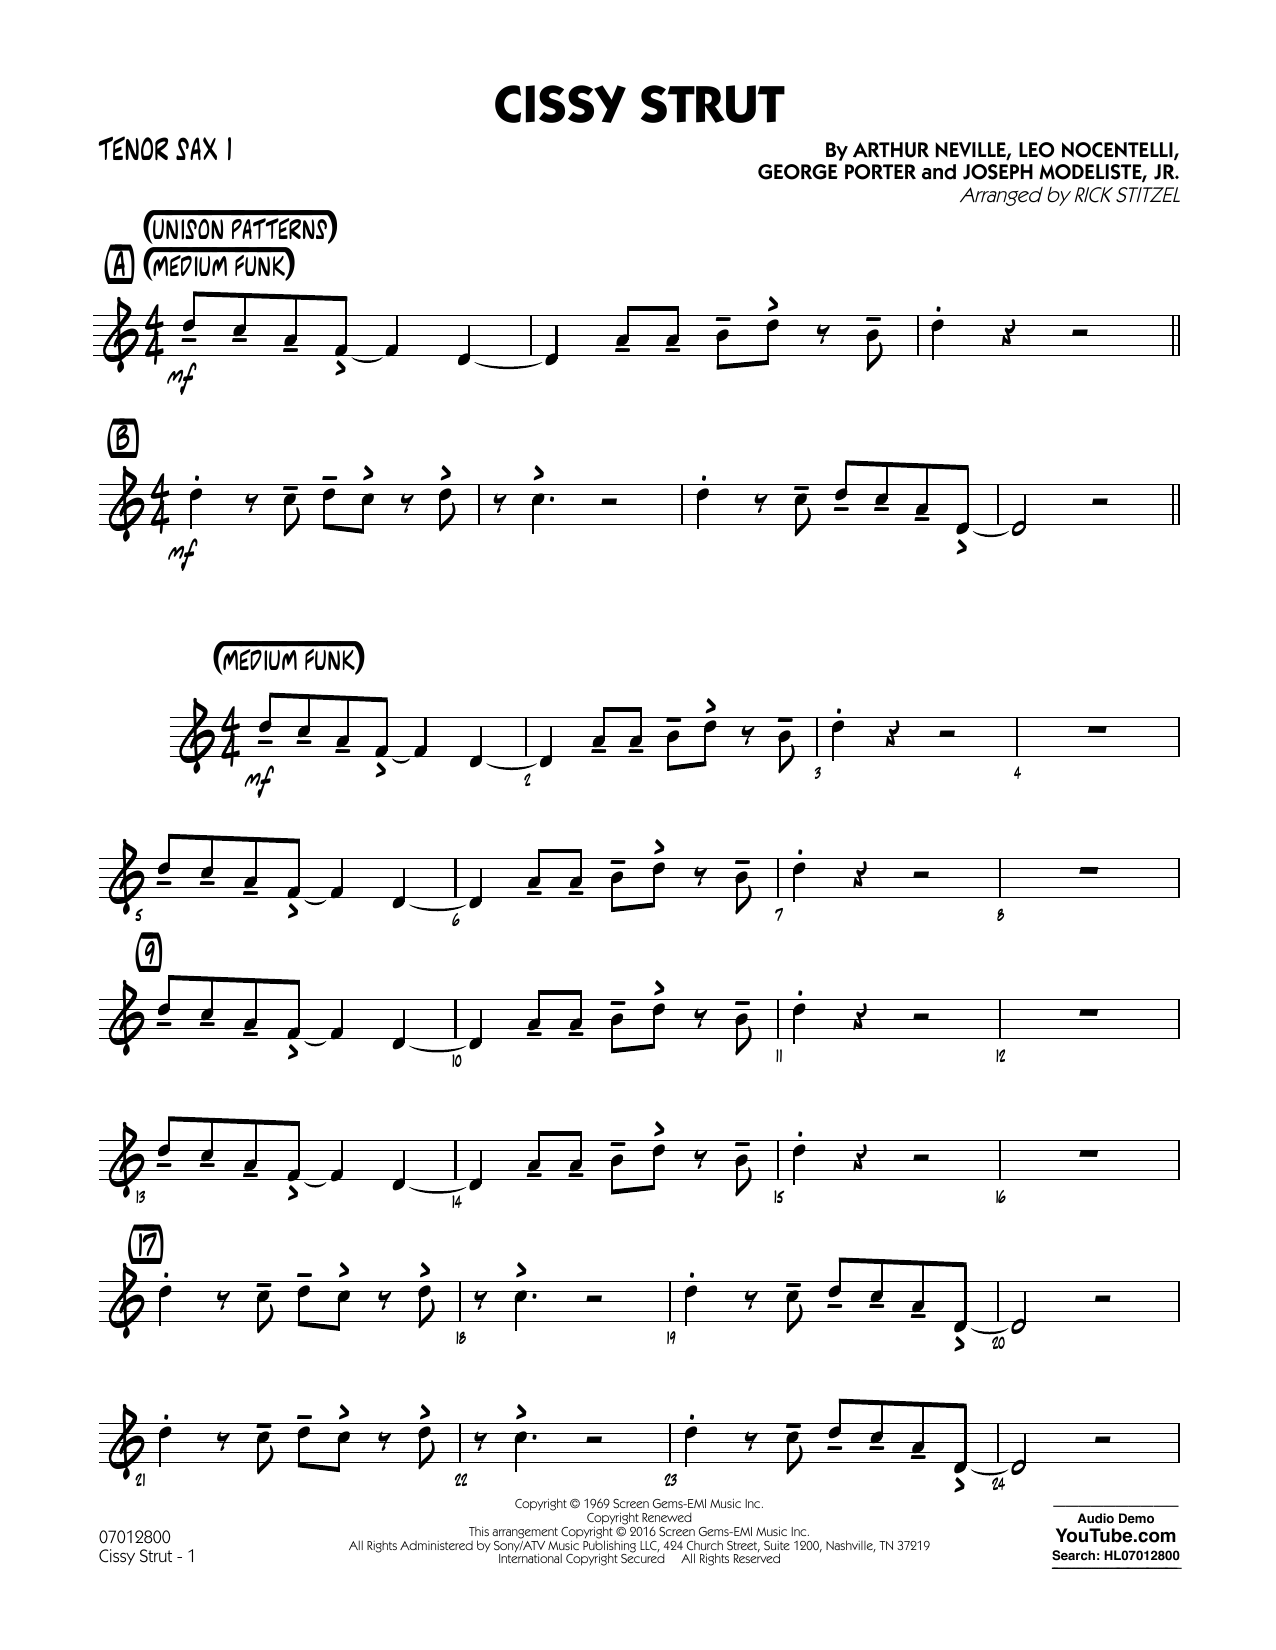 George Porter - Cissy Strut - Tenor Sax 1